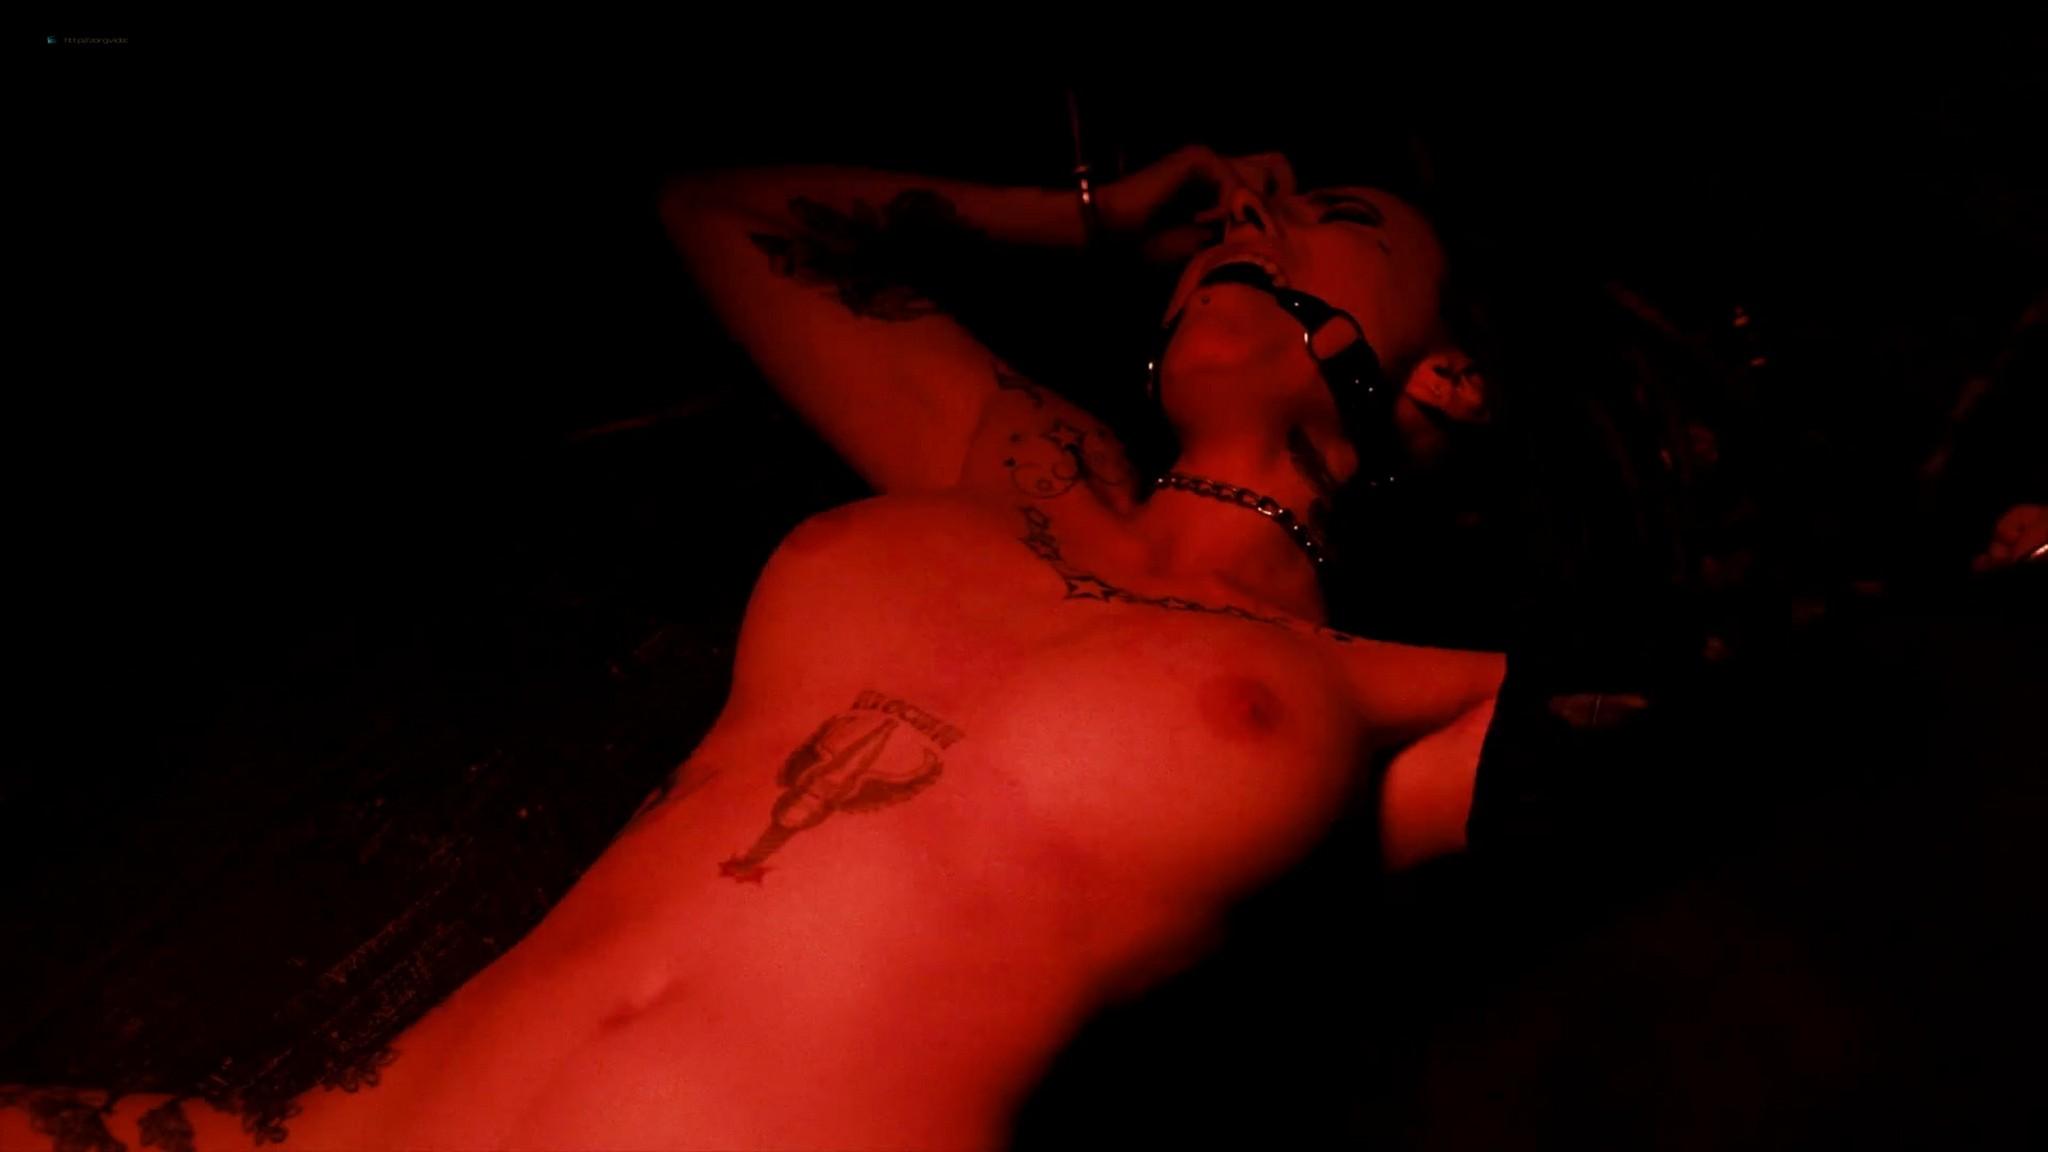 Sadie Katz nude lesbian sex with Victoria De Mare - Hanukkah (2019) HD 1080p Web (4)